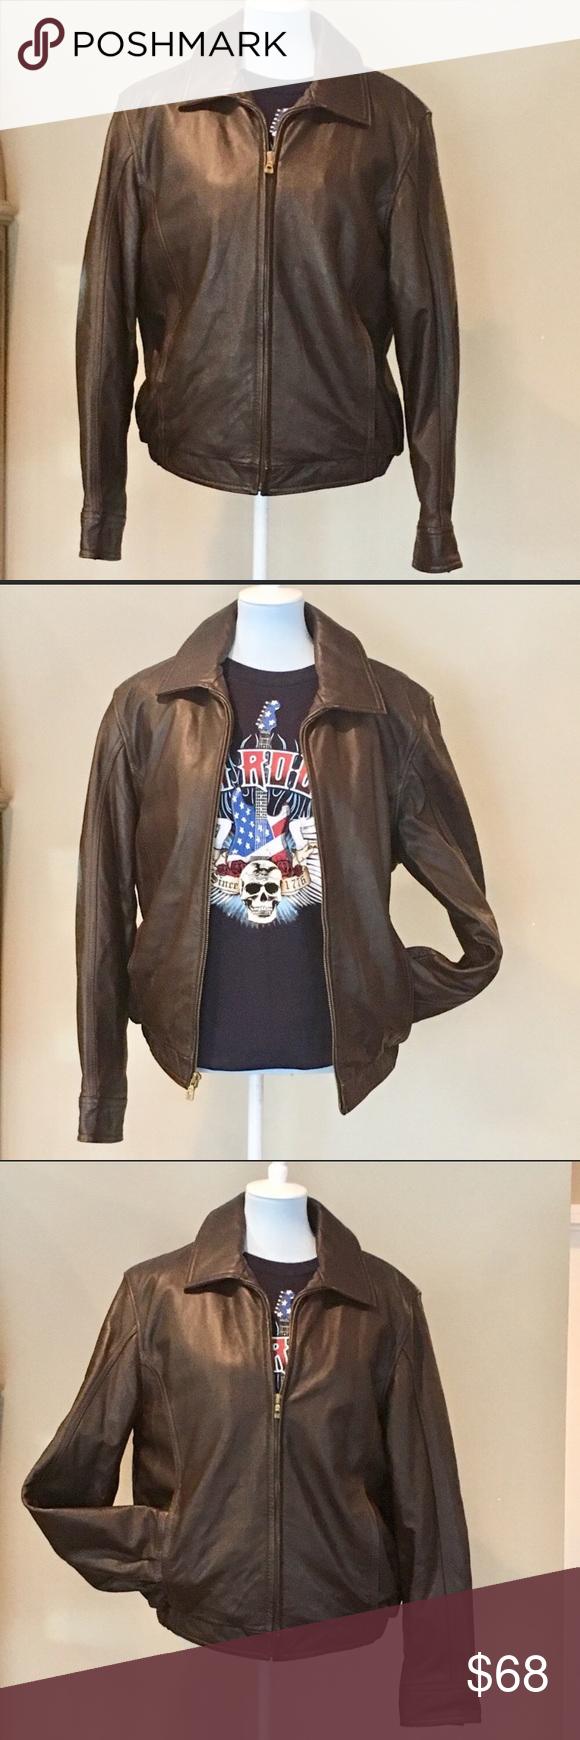 Wilson thinsulate lining leather bomber jacket